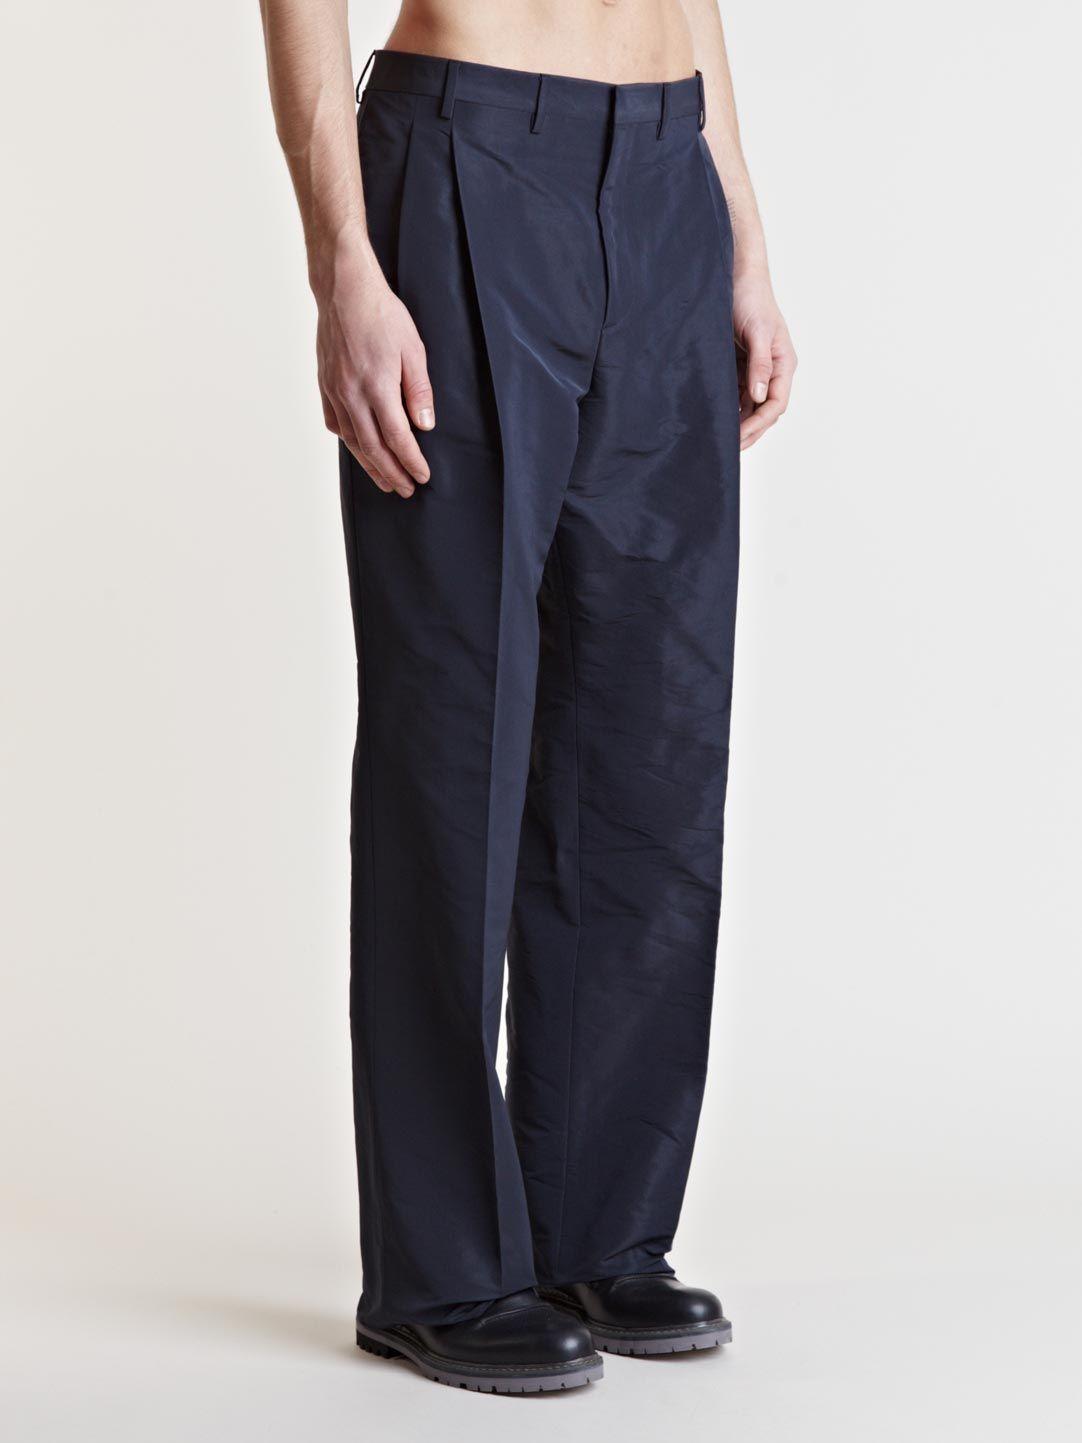 Lanvin - Blue Wide Leg Trousers for Men - Lyst